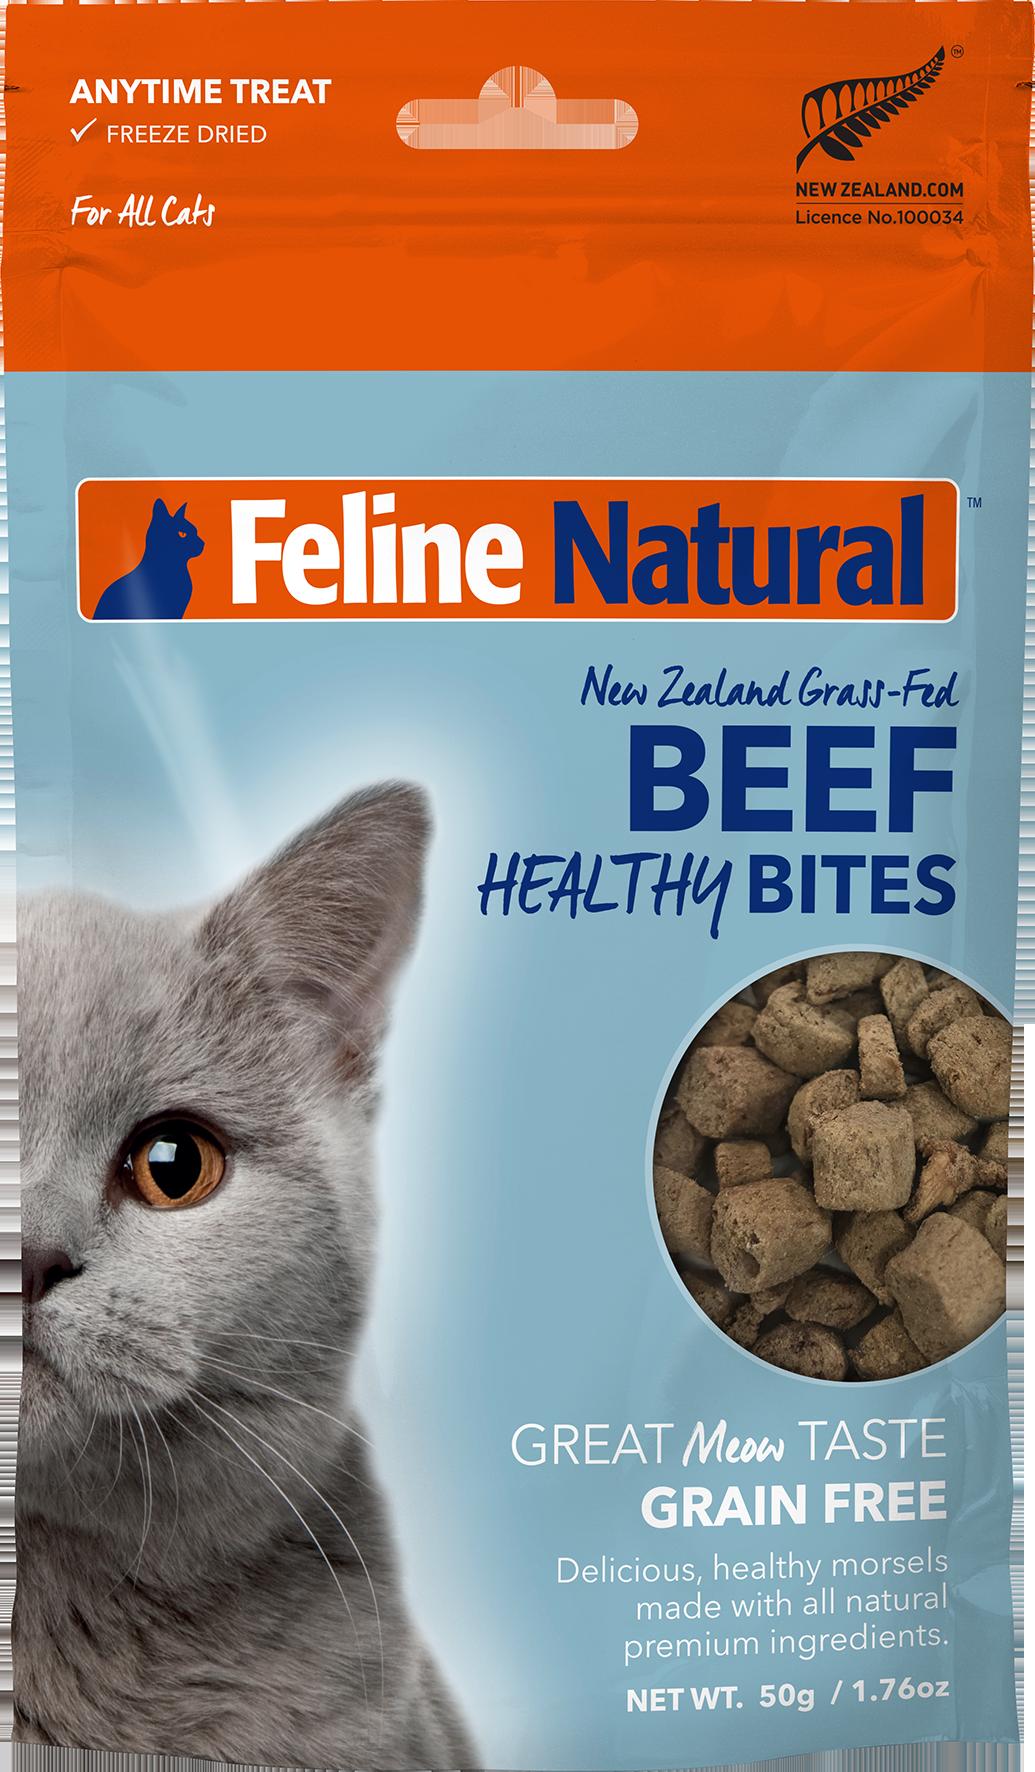 Feline Natural Feline Natural Freeze Dried Healthy Bites Beef Cat Treat 1.76oz